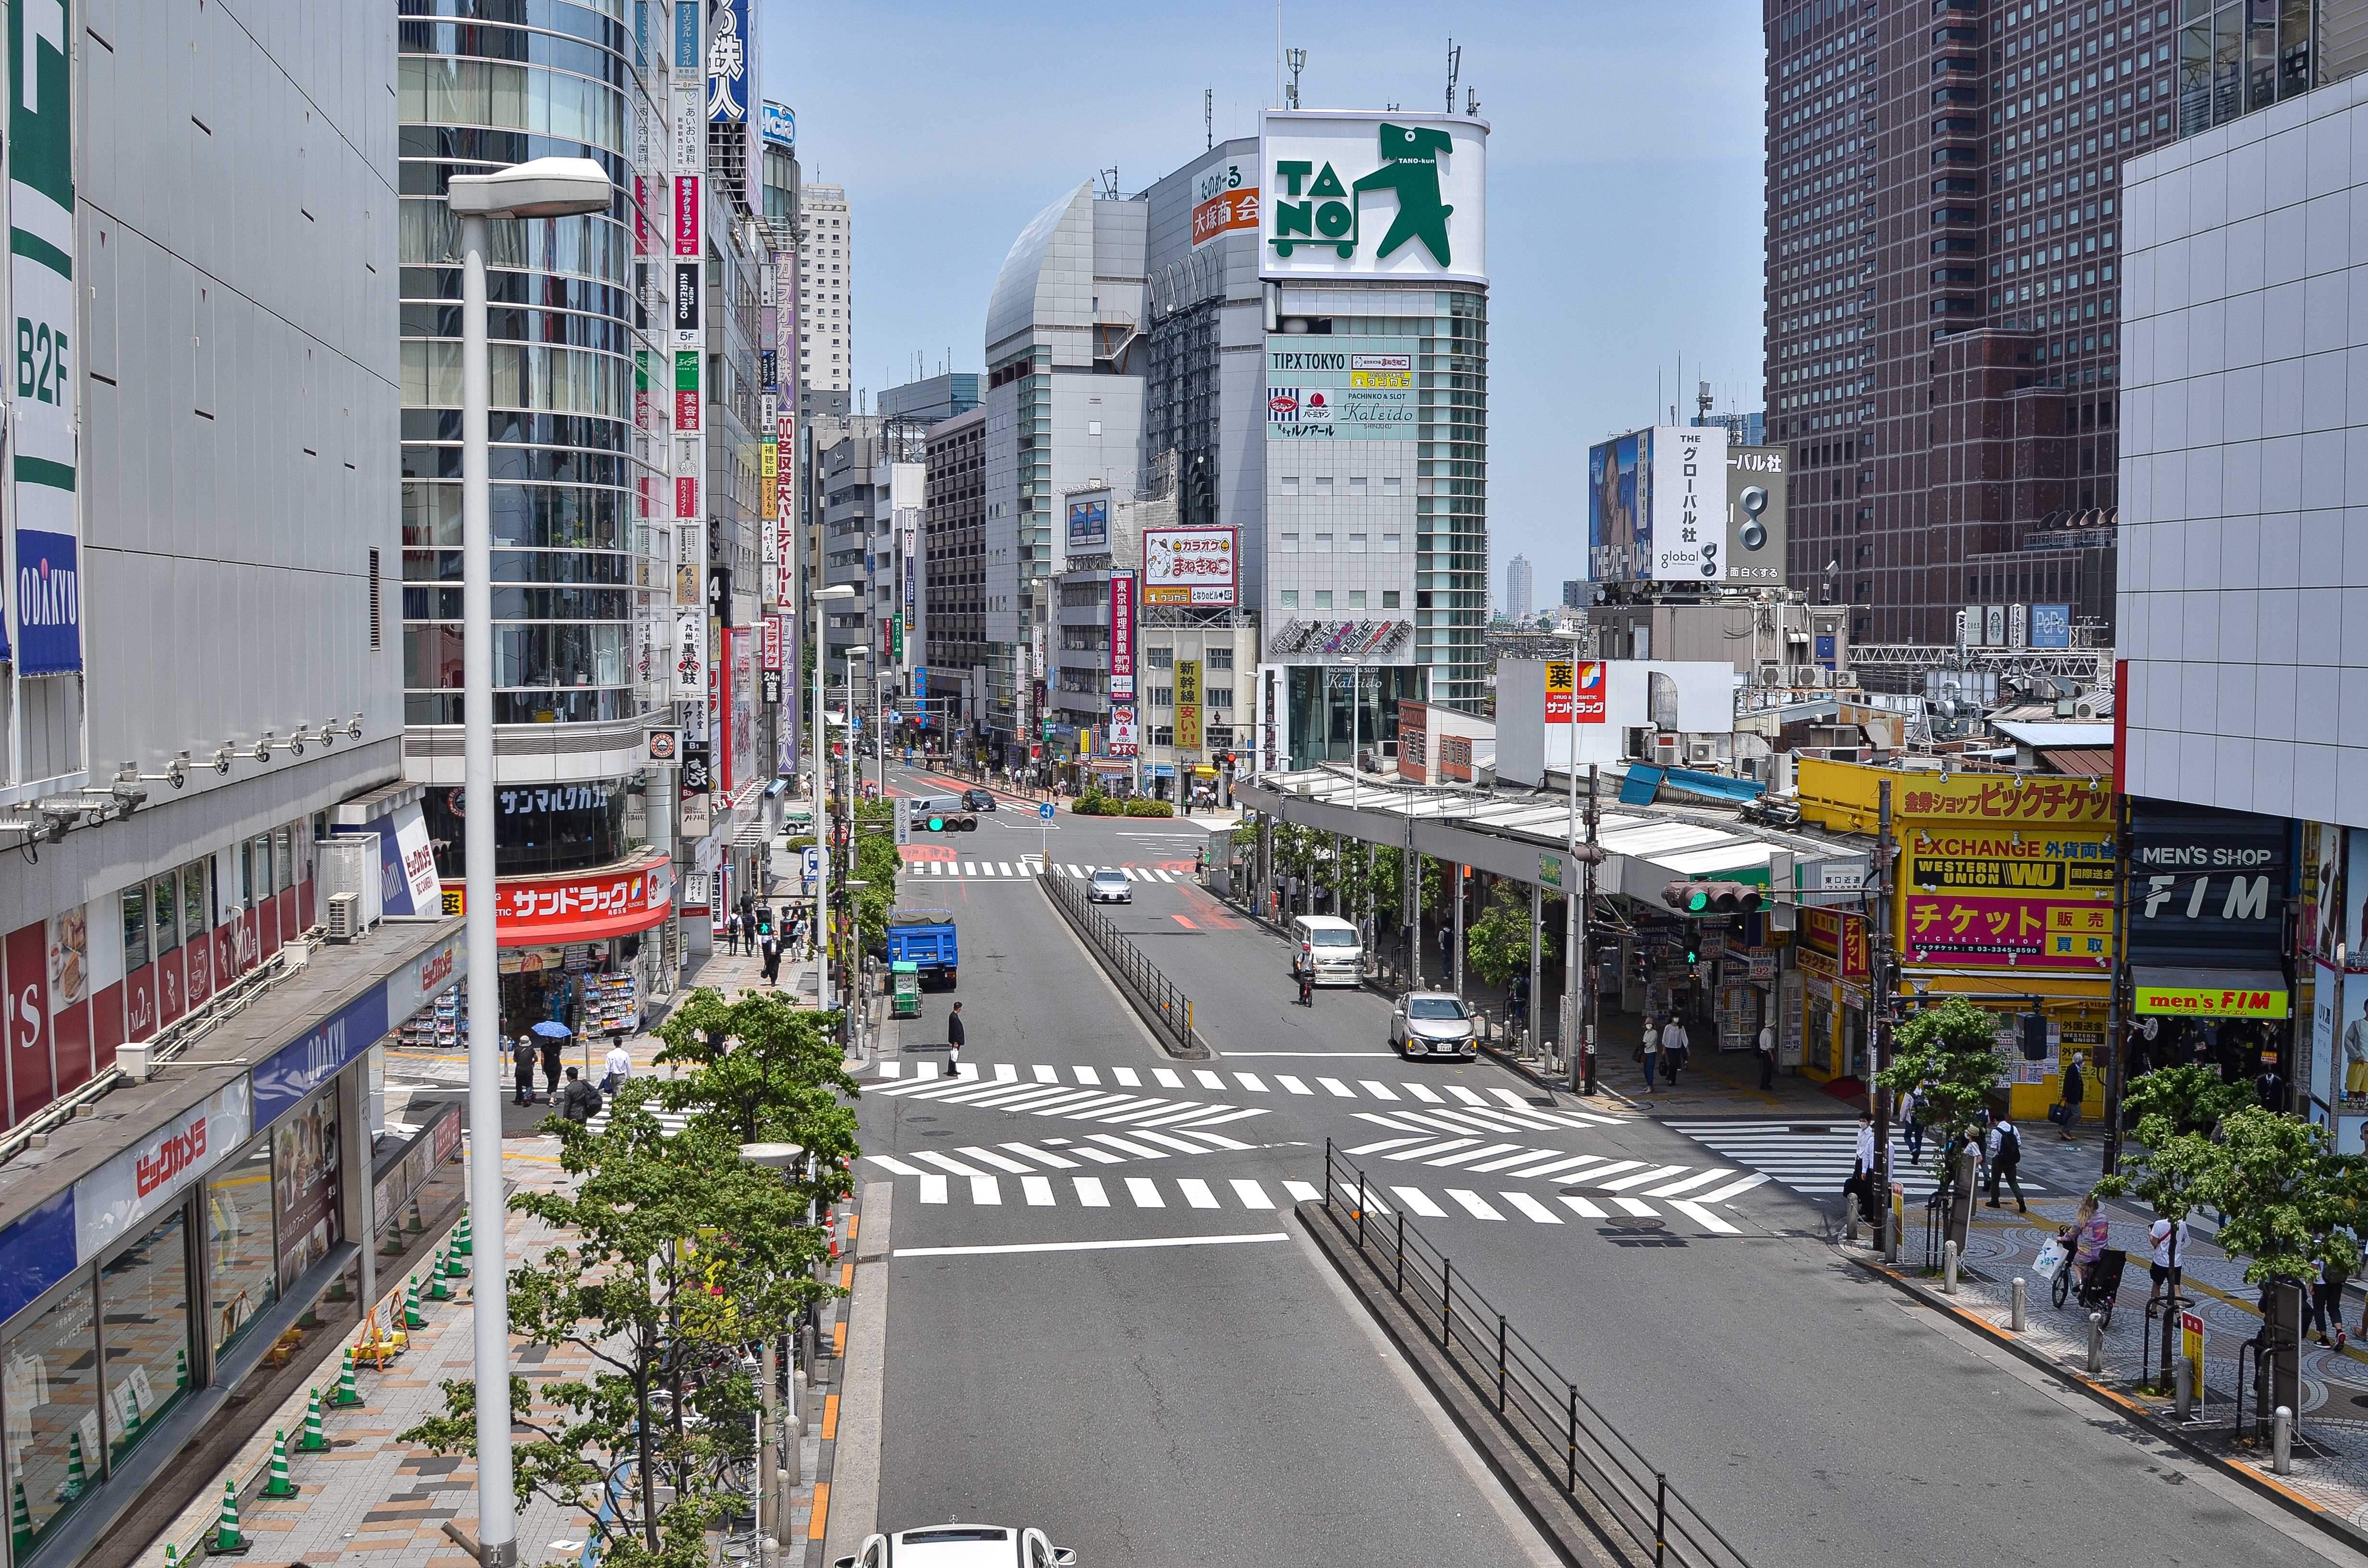 f:id:muramasachang:20210325064342j:image